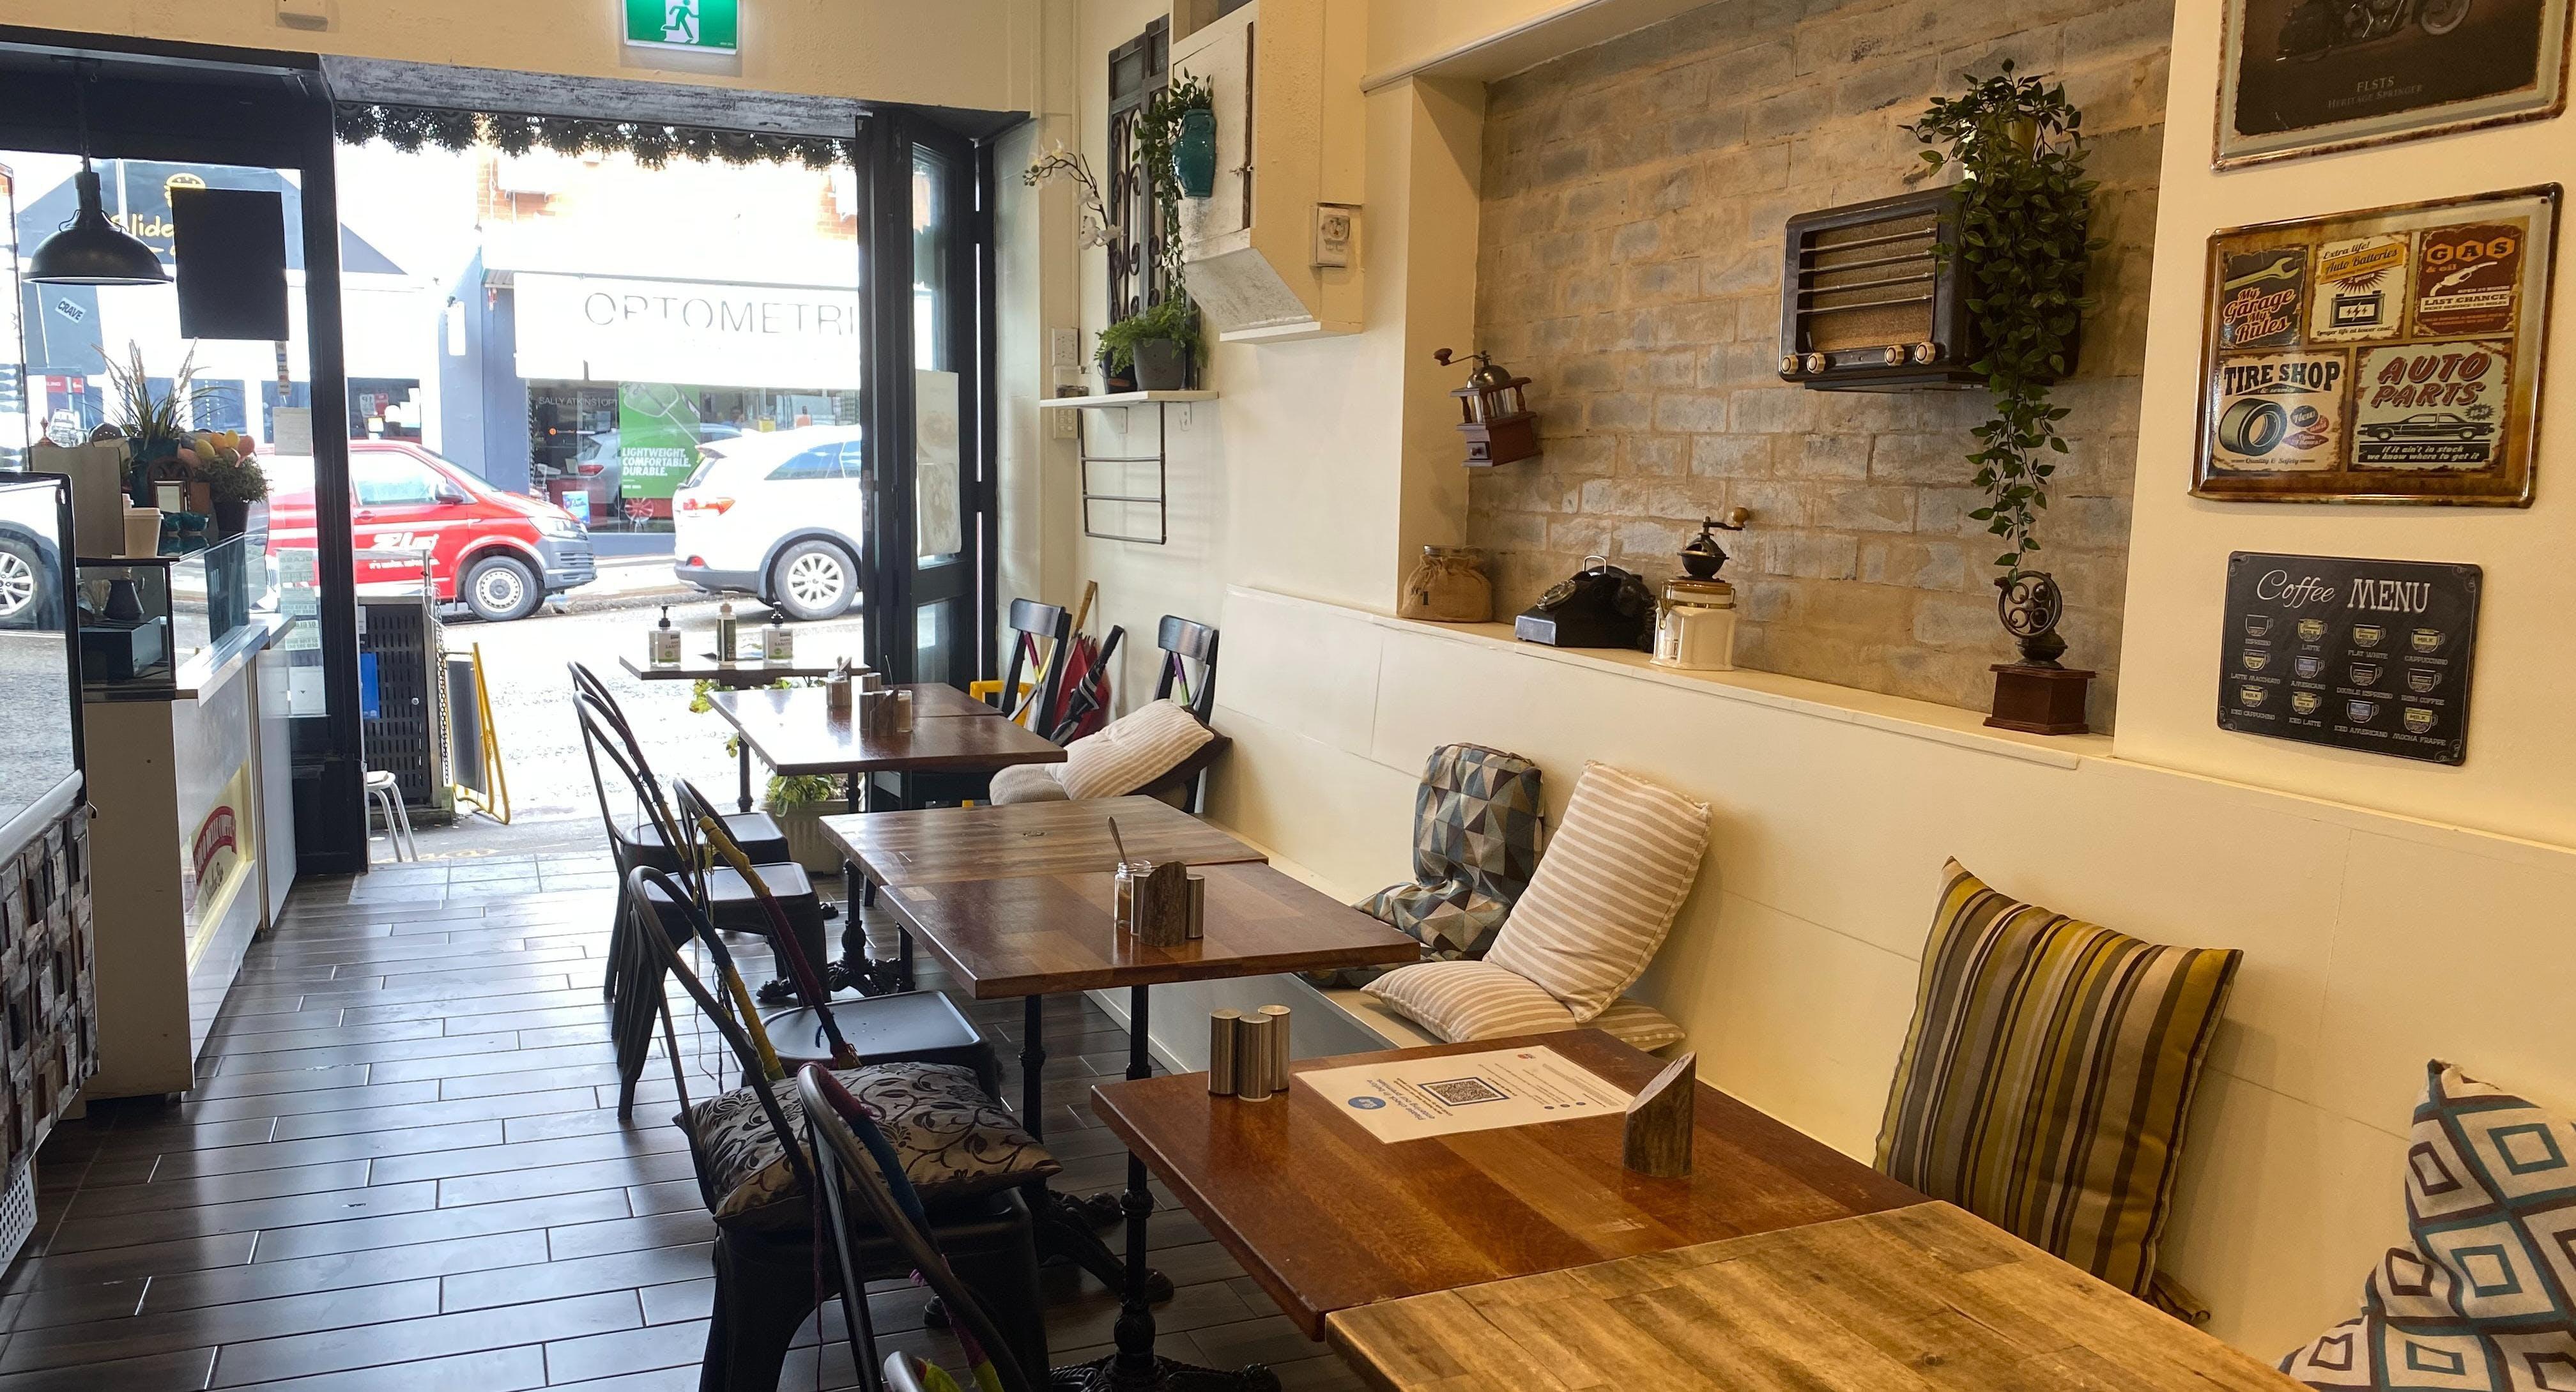 Photo of restaurant Chalkboard Cafe in Gordon, Sydney